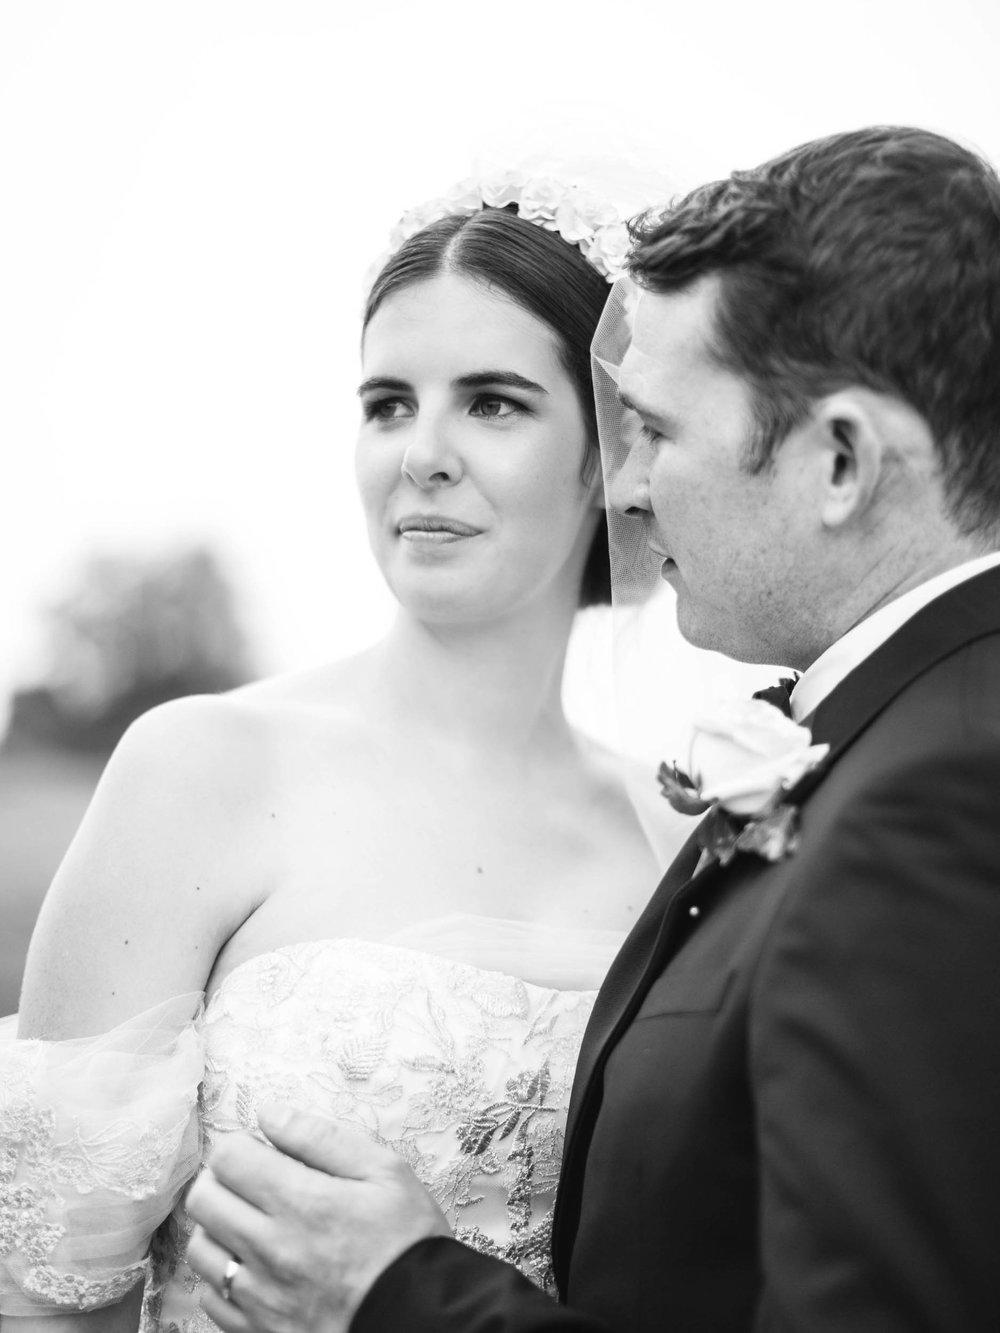 Amy O'Boyle Photography- Destination & UK Fine Art Film Wedding Photographer- Stoneleigh Abbey Wedding-57.jpg